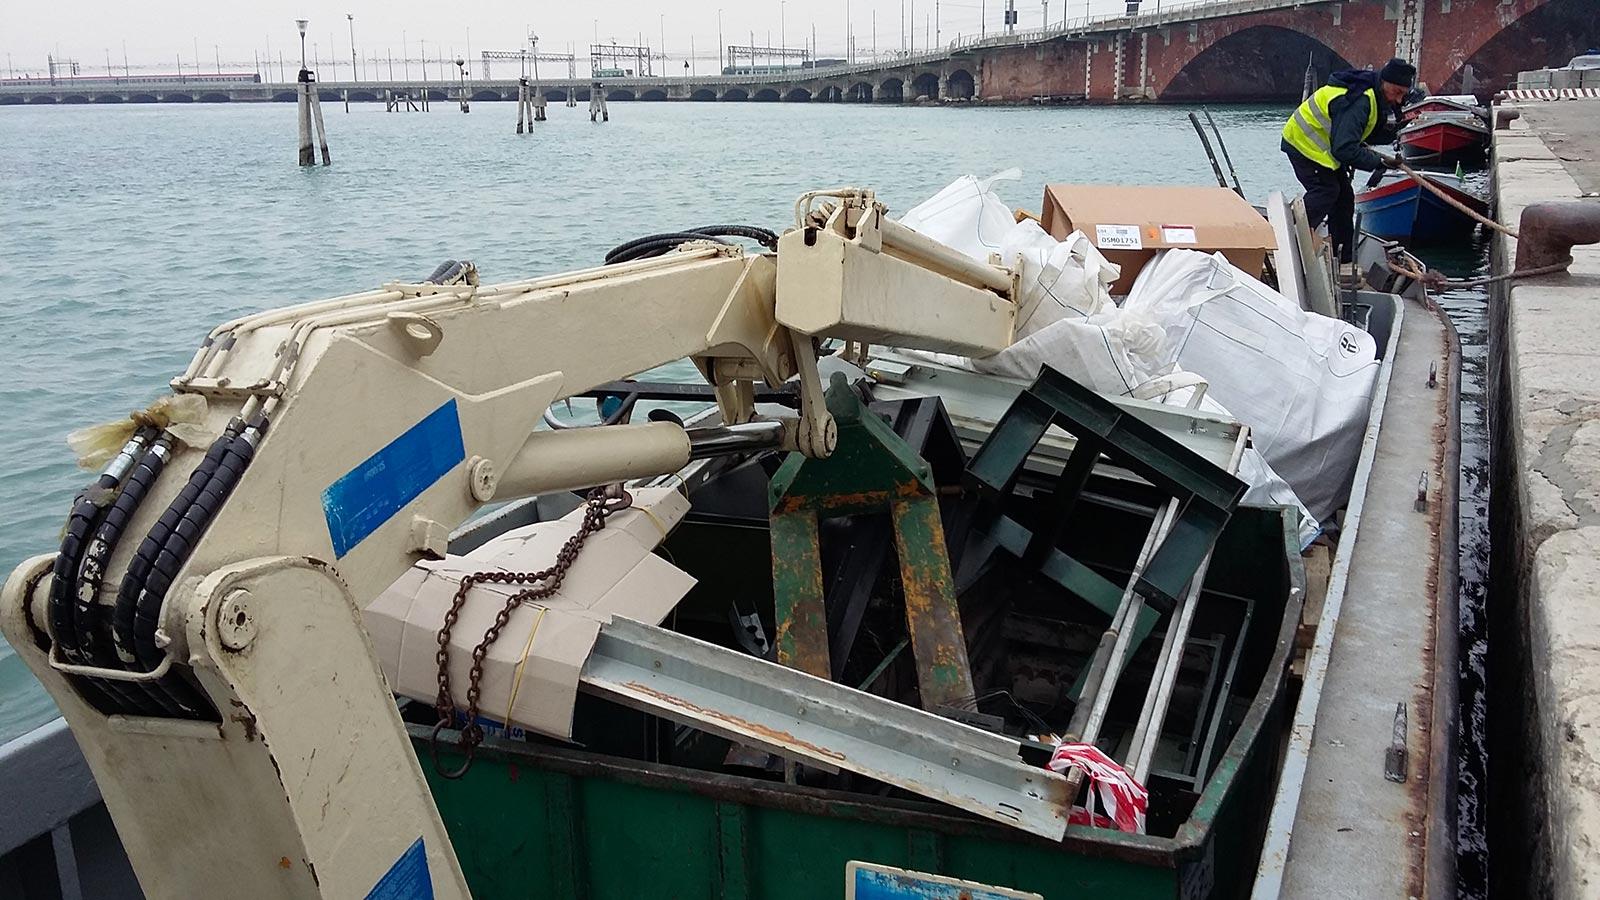 Trasporto rifiuti ingombranti